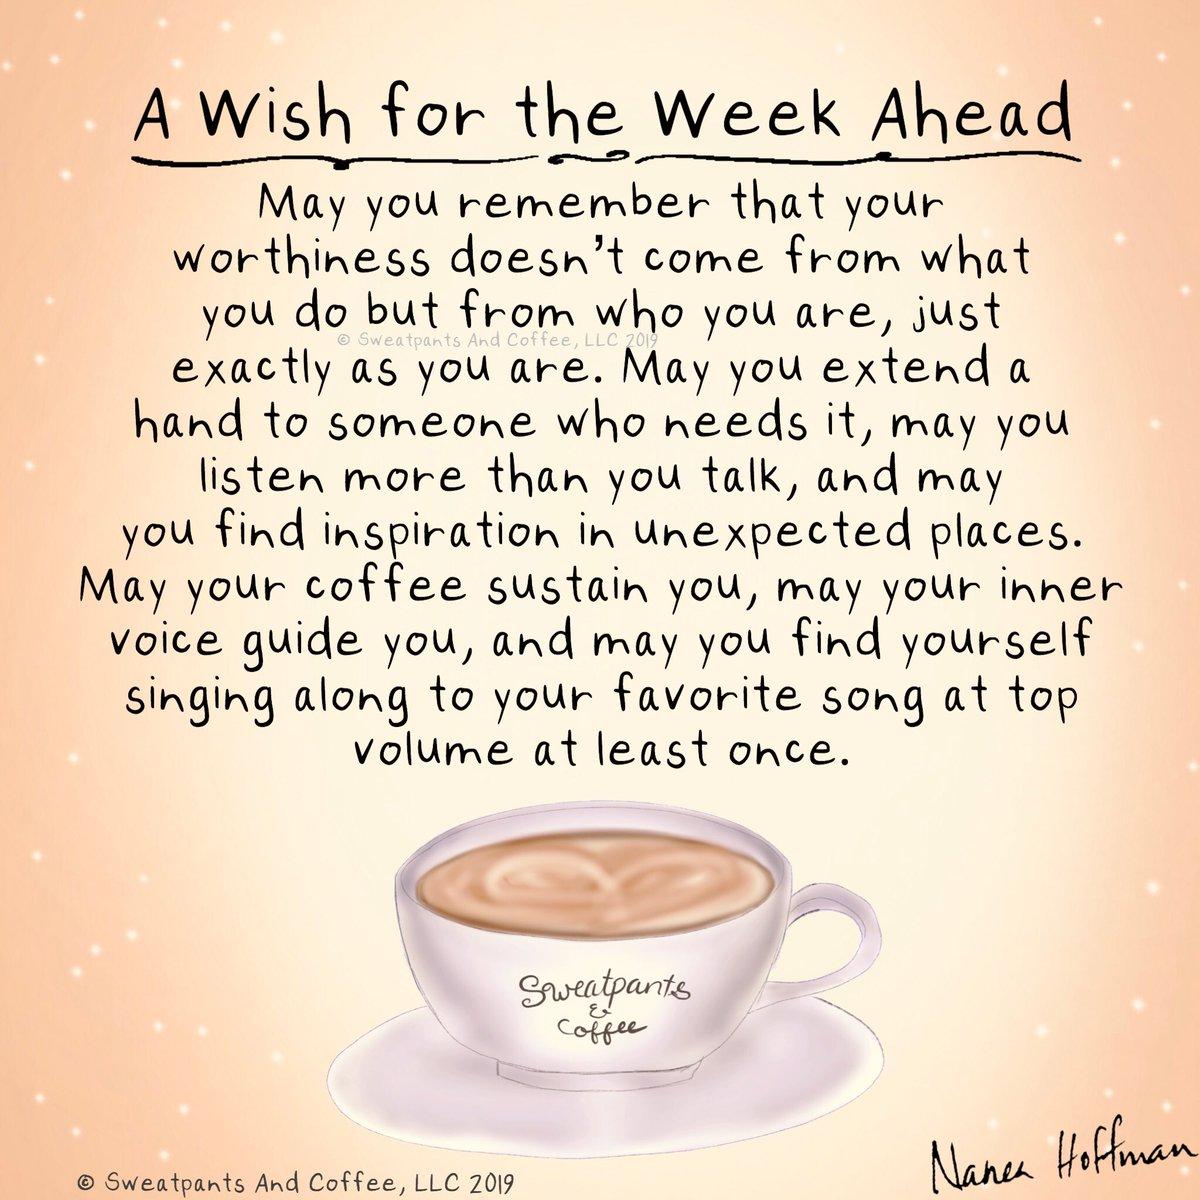 Sweatpants Coffee On Twitter A Wish For The Week Ahead Coffee Coffeetime Coffeelover Coffeequotes Coffeememe Sweatpantsandcoffee